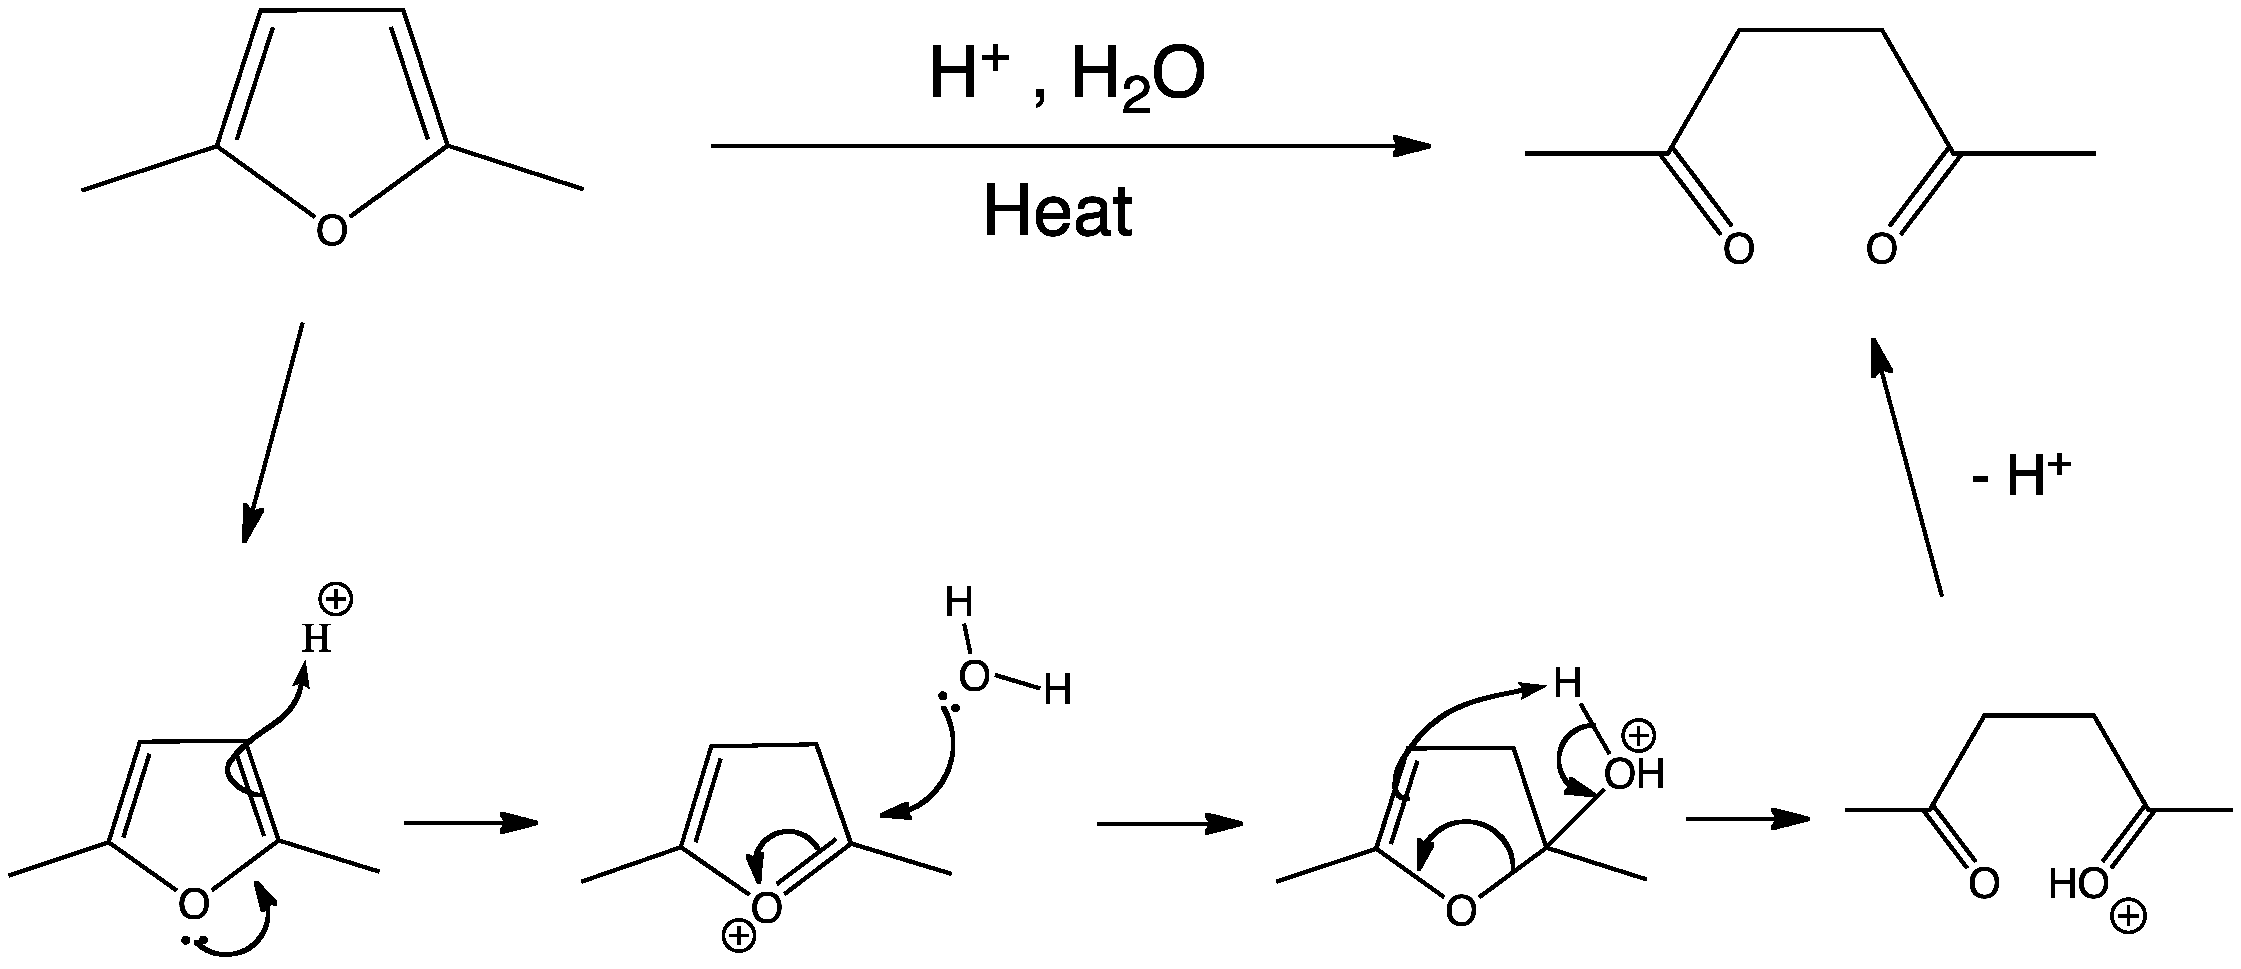 Aromatic Heterocycles Reactivity Furan Hydrolysis